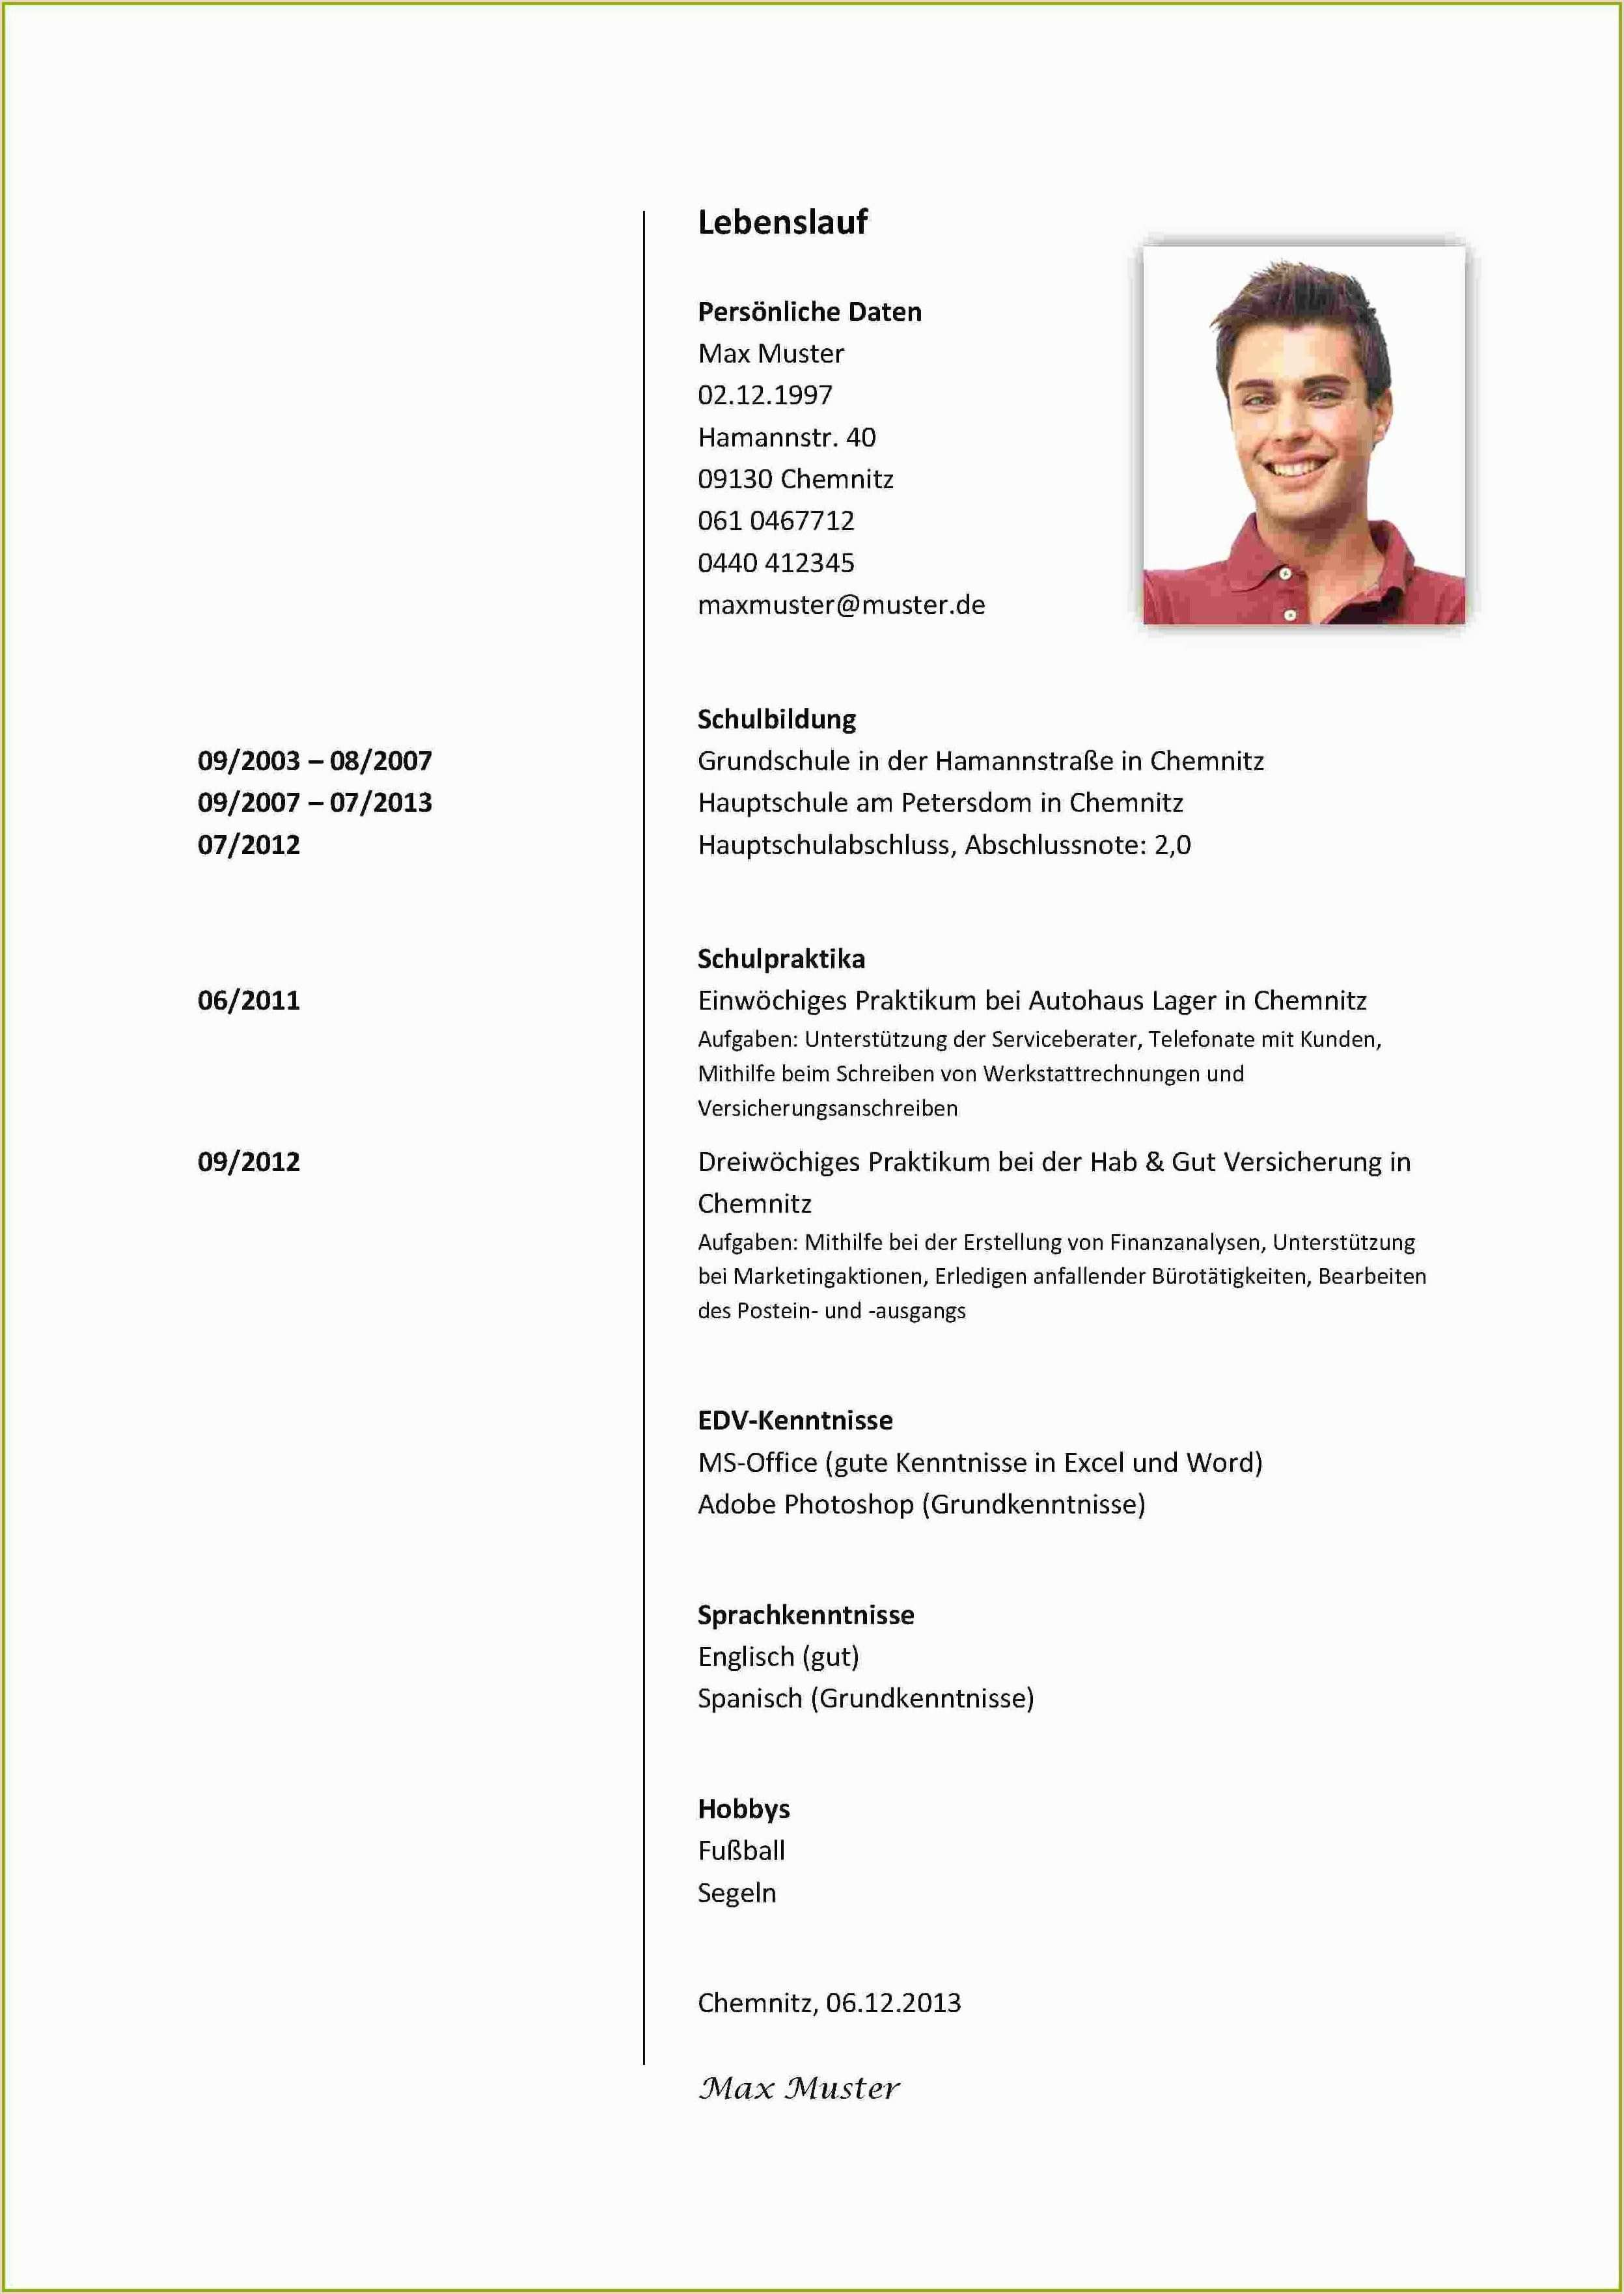 Lebenslauf Vorlage Fur Schuler Praktikum Myoscommercetemplates Com In 2020 Cv Examples Document Templates Resume Examples